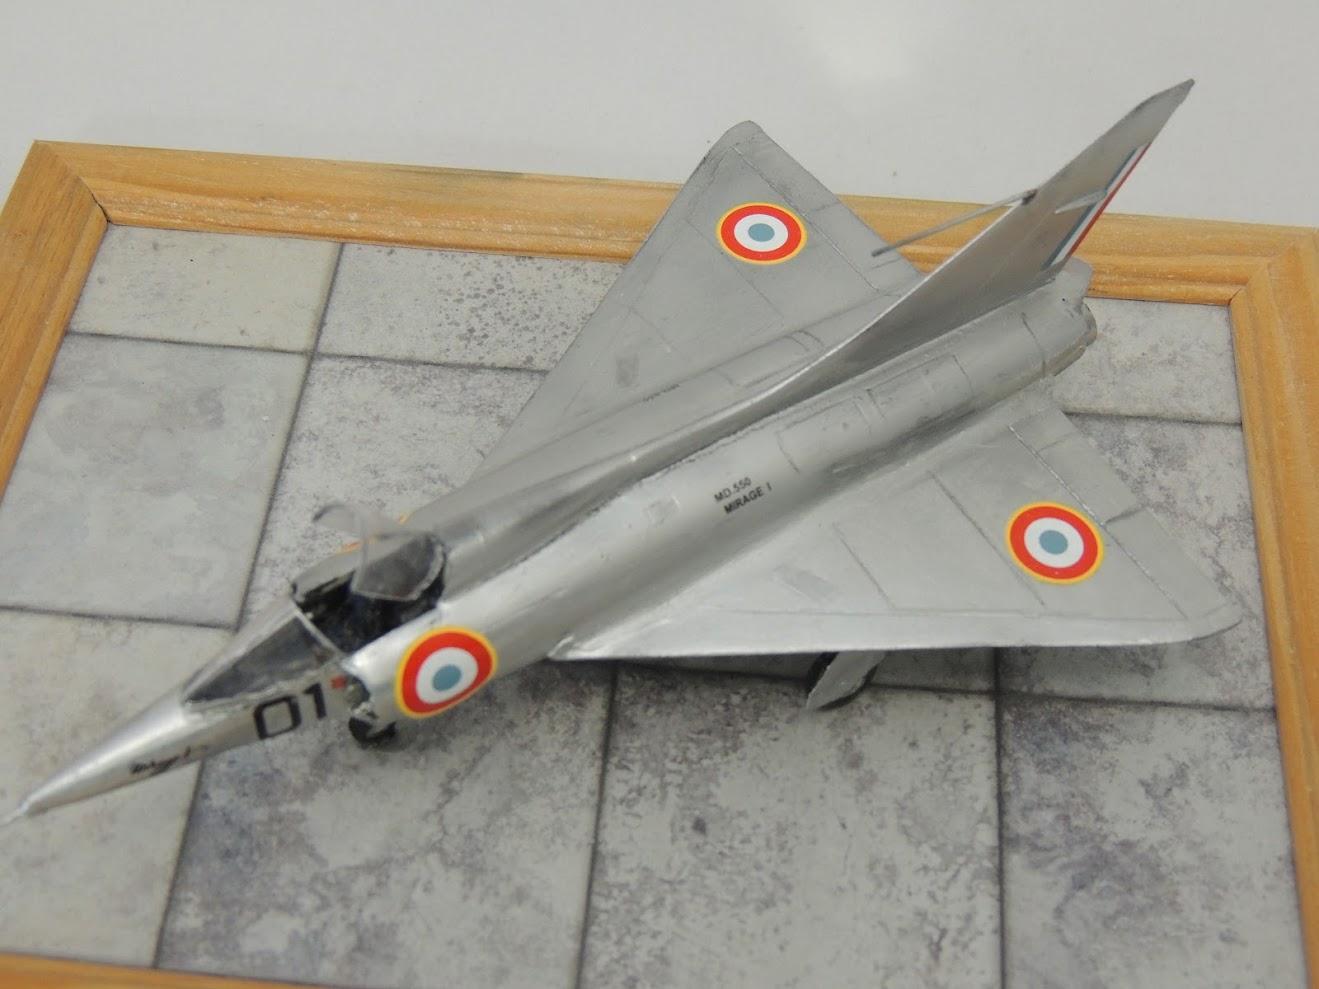 Dassault MD 550 Mirage I - Dujin ZoMvVPvdVw4zLCXyuXAKwcsJap9xgJRM5dWYvtzWE36UUQL0GTm7iRbFS2kUjpbL5ATeyUJKz9QnrTL03sb7CxhqFeziqsGL5jHaUnNNH86mYVXJzSEadmBX0OFGoKxO1waESdaxBJg9j_qCGiwEY0fQPyEjqclhBxvXskOvUofMMx0cpTj_Af9xIMBe5guzyKQ2fGWgYh1hB3gEhq0FVTFrcmryo4MAKl4It-aTtdNHOrAB1Q6IsmXCl8Z_4cL-FgaHRIUHa42DtqvK59Gn_cXz32hVSw1N6xmYywIA6XZK5FftIPUjsWYKvcCqEcMw38soWvsYbxbpEfKCtWcunu4evRlvZxv1NKO9qxBEhH-9wg96Kda2jxYmtHcW0ObgKzdkgULu5guslppyg6D5mHopTdObmmGct_lNuhVRkfNRE-31Uo18pd7gkbXrBgT0ElDikB0-D0oFJZZxR9hkfMH6XtsovwWHqyOmuvqAFmNrpYUK0pFHaPbXrEXqdGsMZjM0jMZNU0btnaGGAbwGH_uzYkRpm-R0K9LS_jras8xL0lLffh2ztG5fYU-6D-rH2EH0L91awKCq8xTLe1UEya_02BKeleux5g5D__M=w1319-h989-no